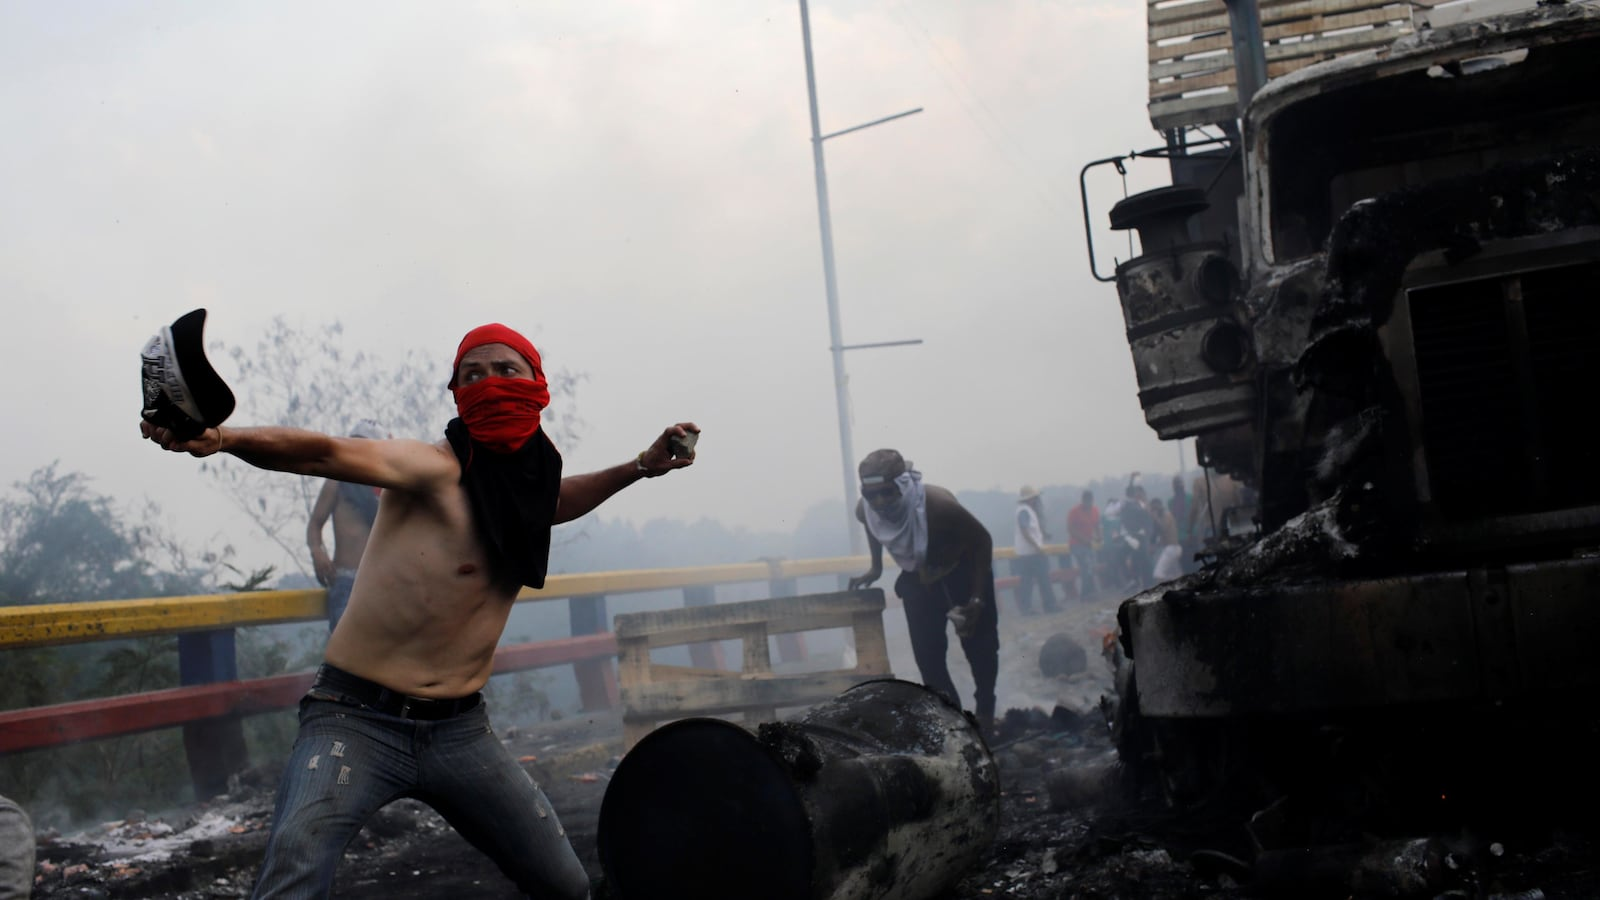 venezuela-manifestation-pont-camion.jpg